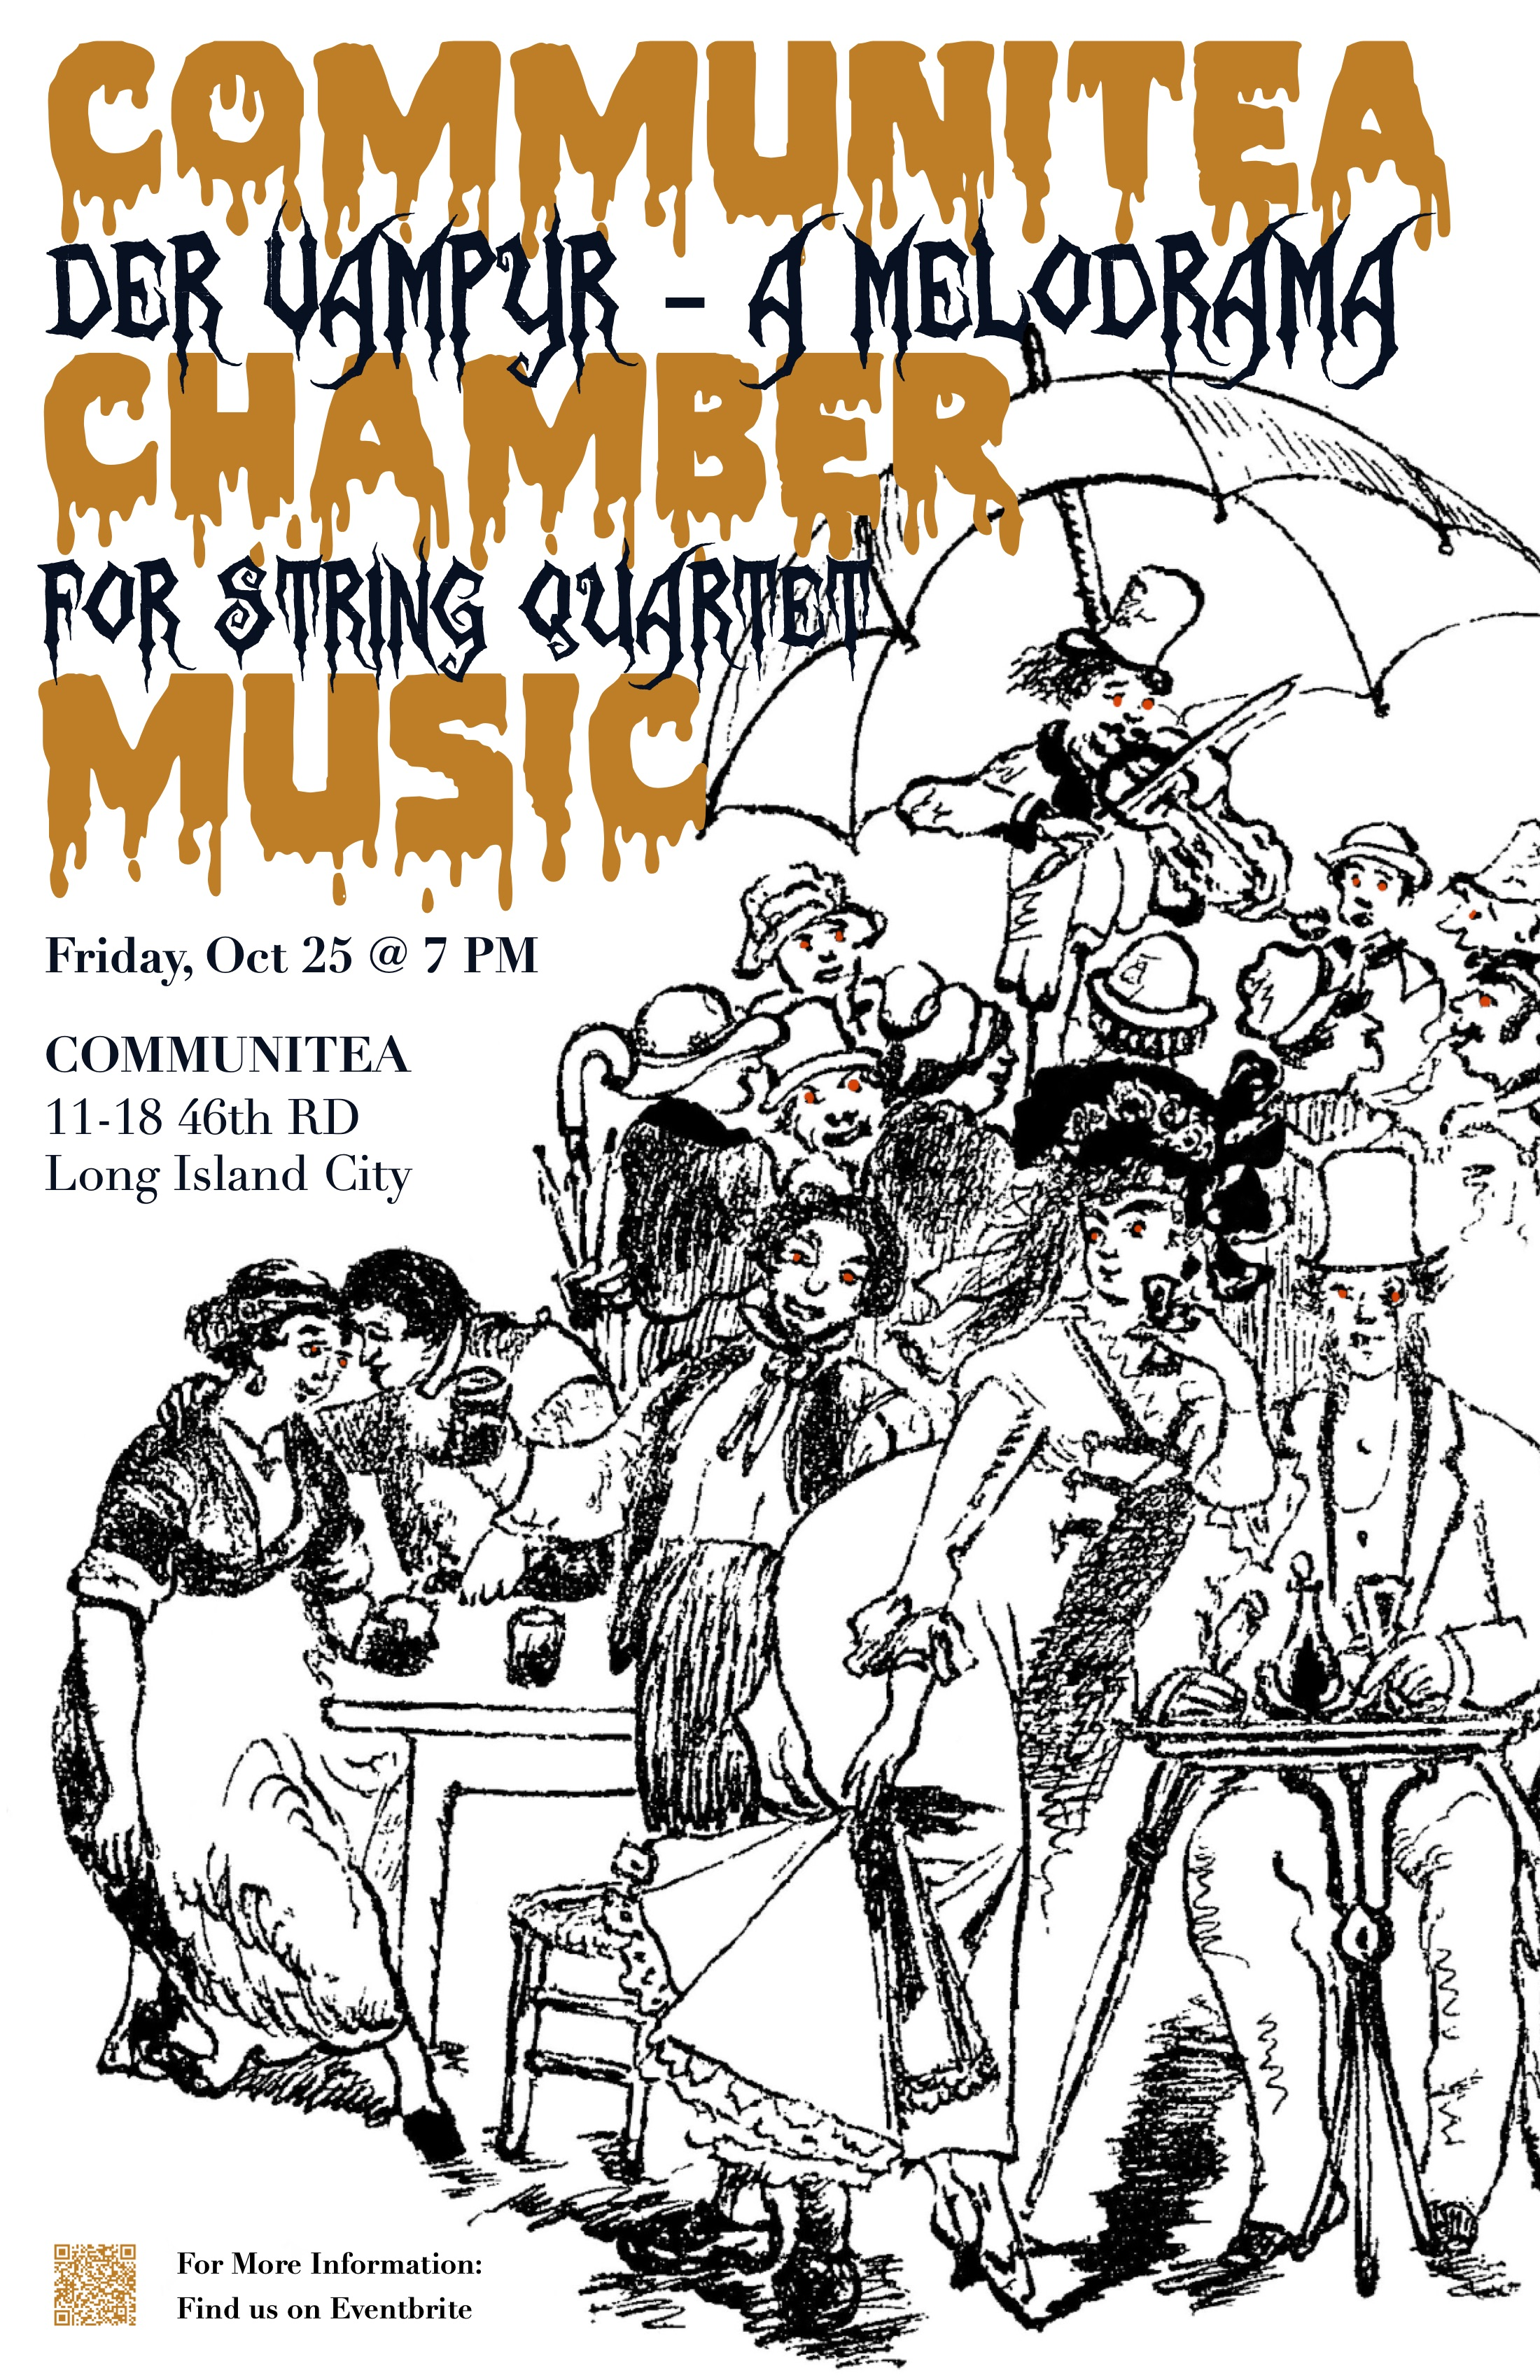 Communitea Chamber Music Poster - Der Va